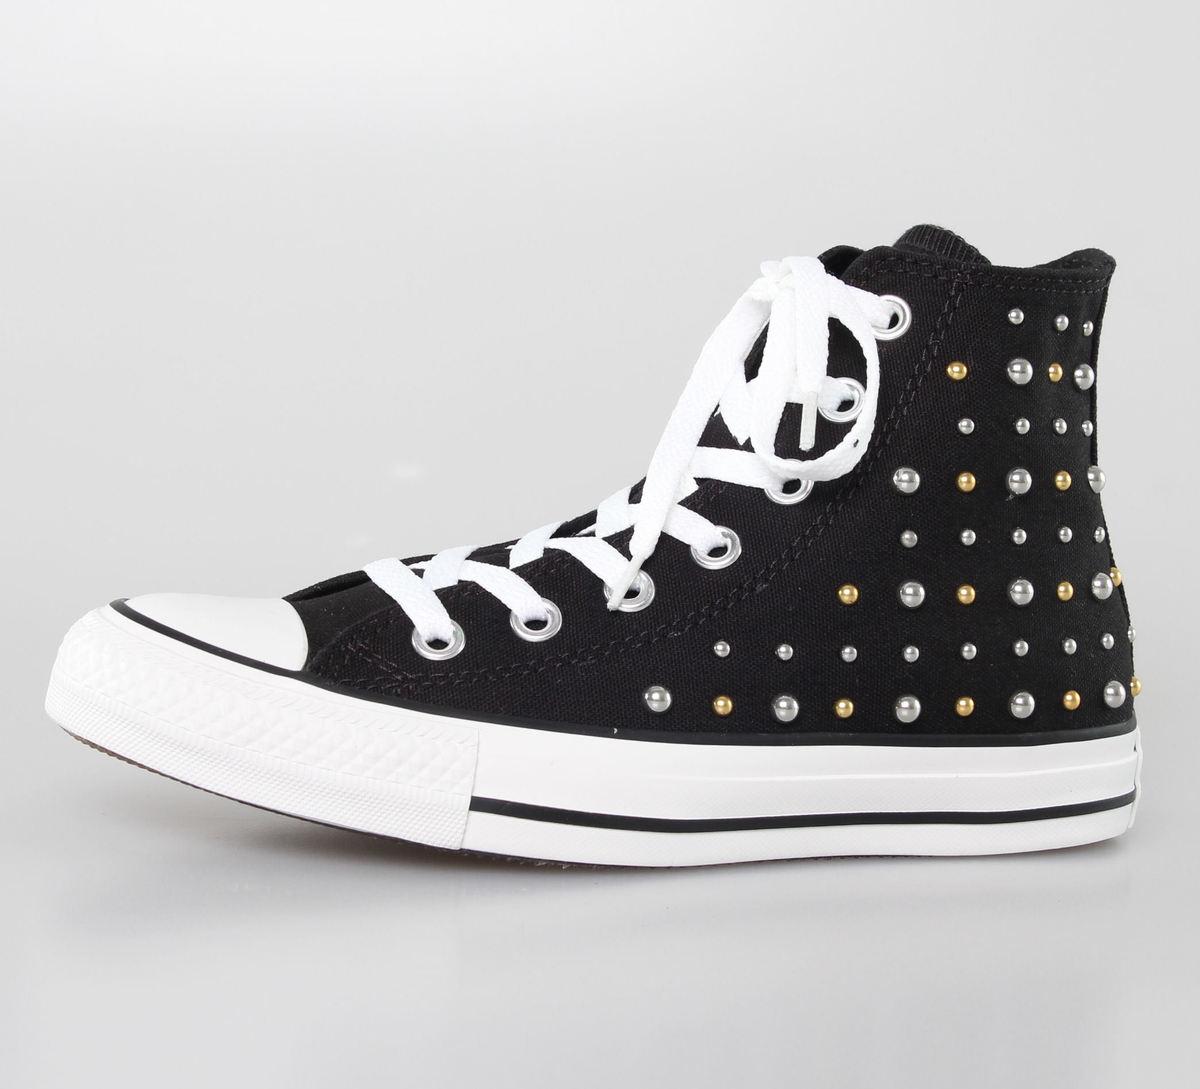 boty dámské CONVERSE - Chuck Taylor All Star - Black - C544881F